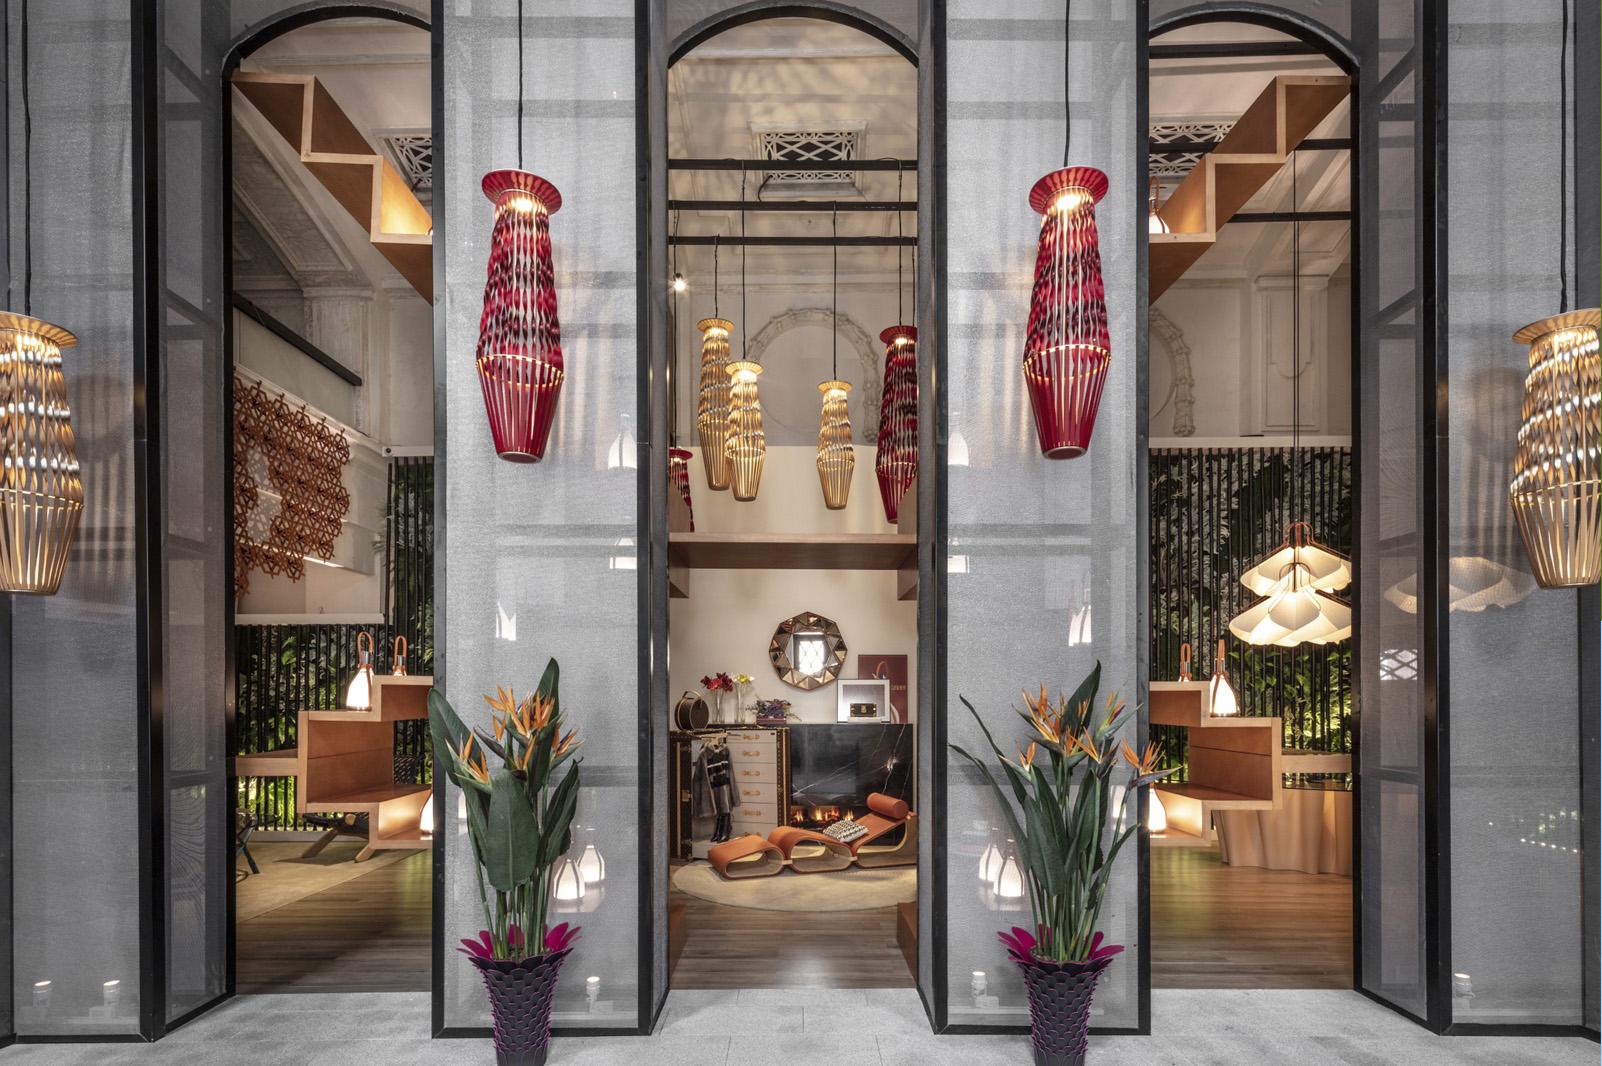 Art Basel 2019 - Louis Vuitton